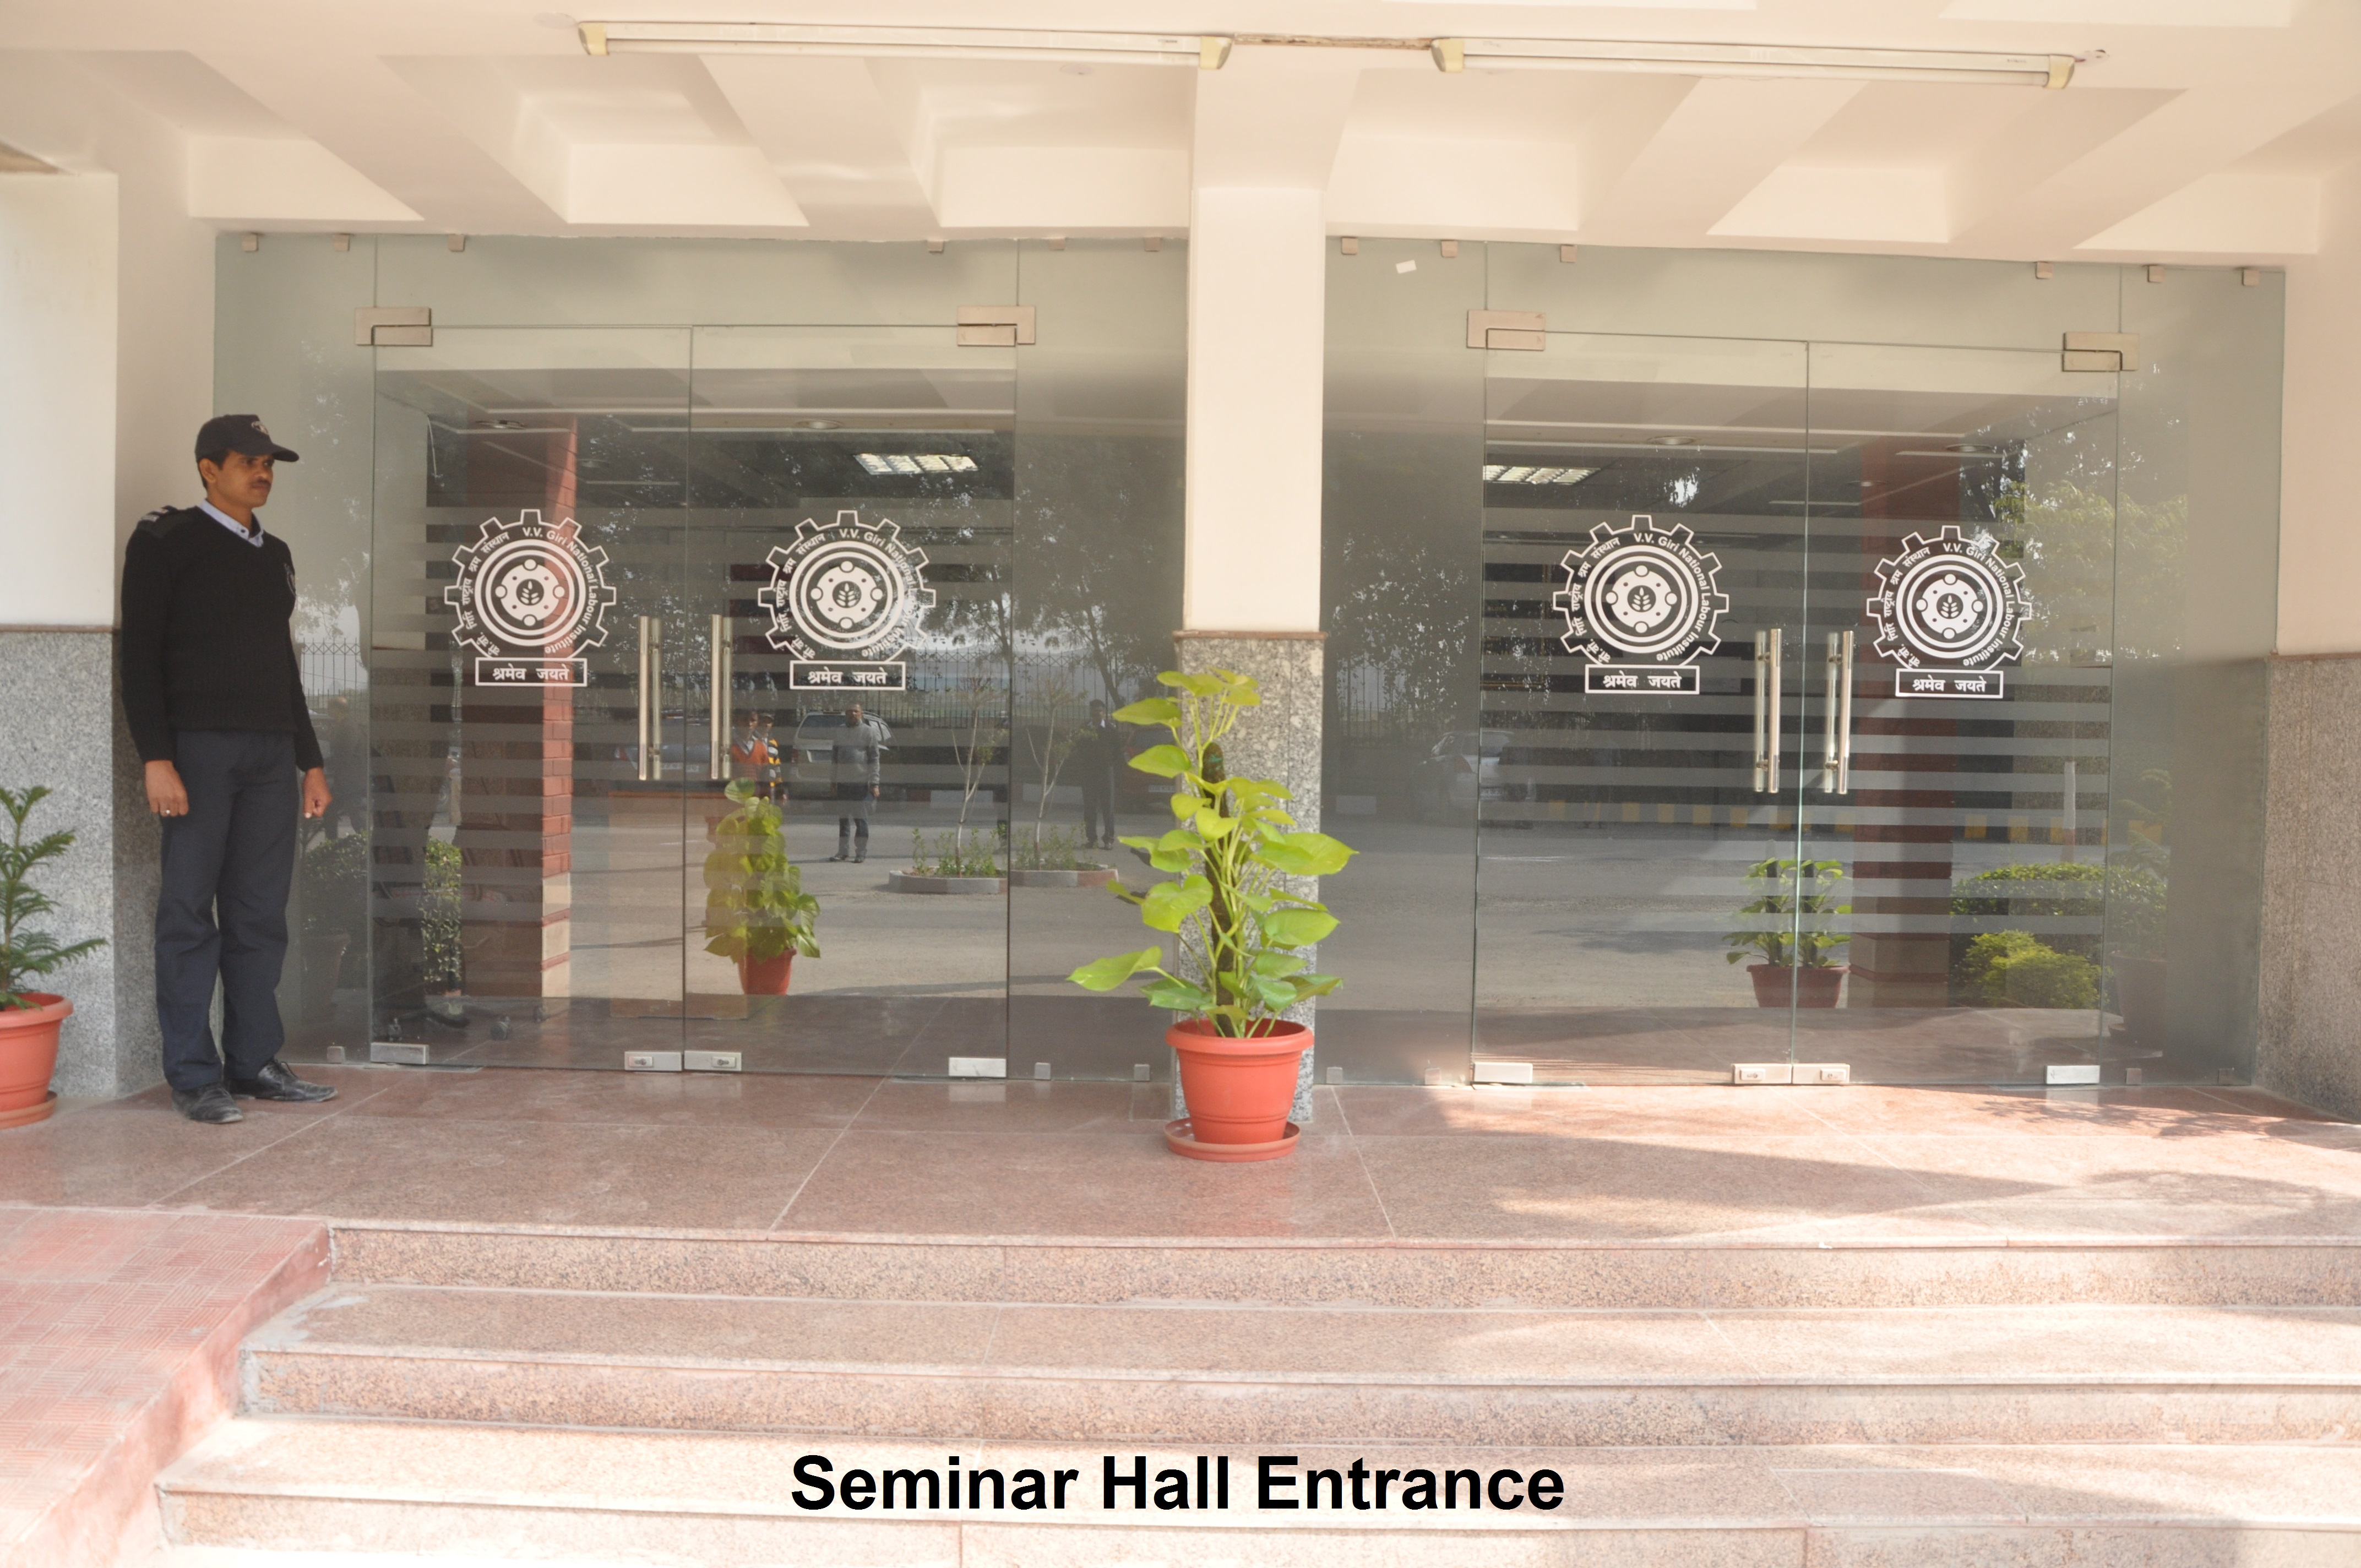 Seminar Entrance Hall